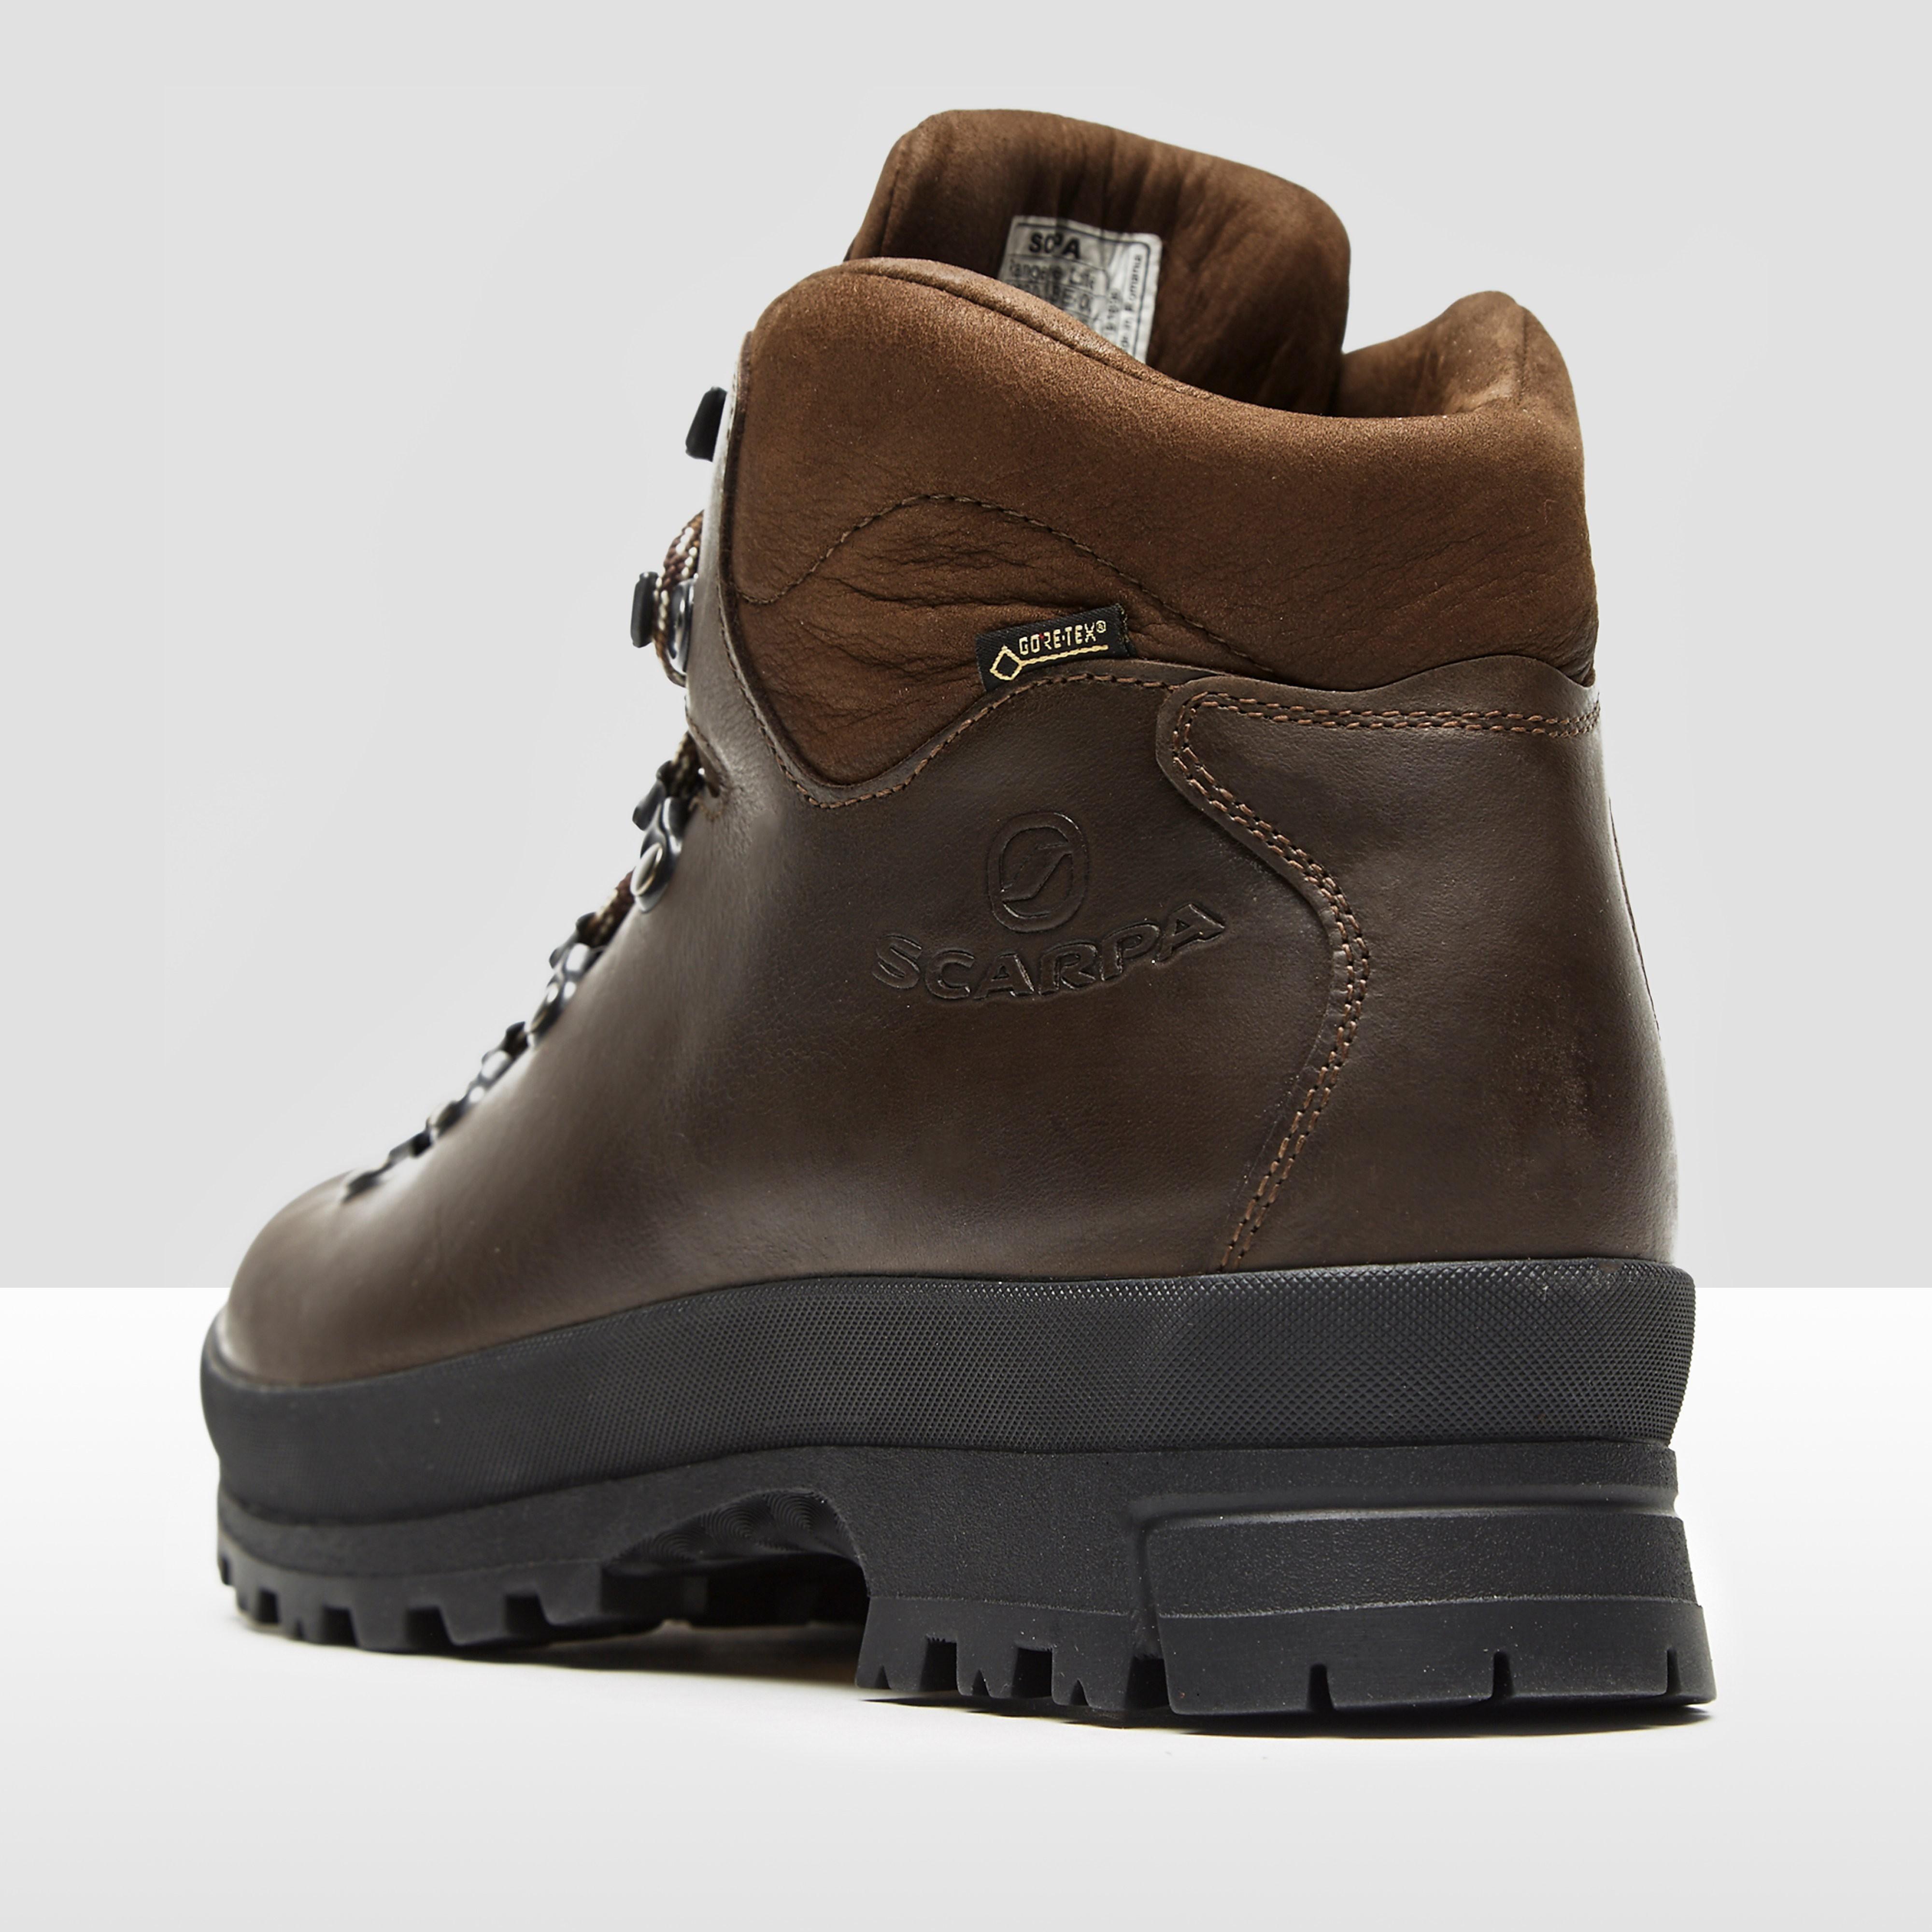 Scarpa Ranger 2 GTX Women's Walking Boots